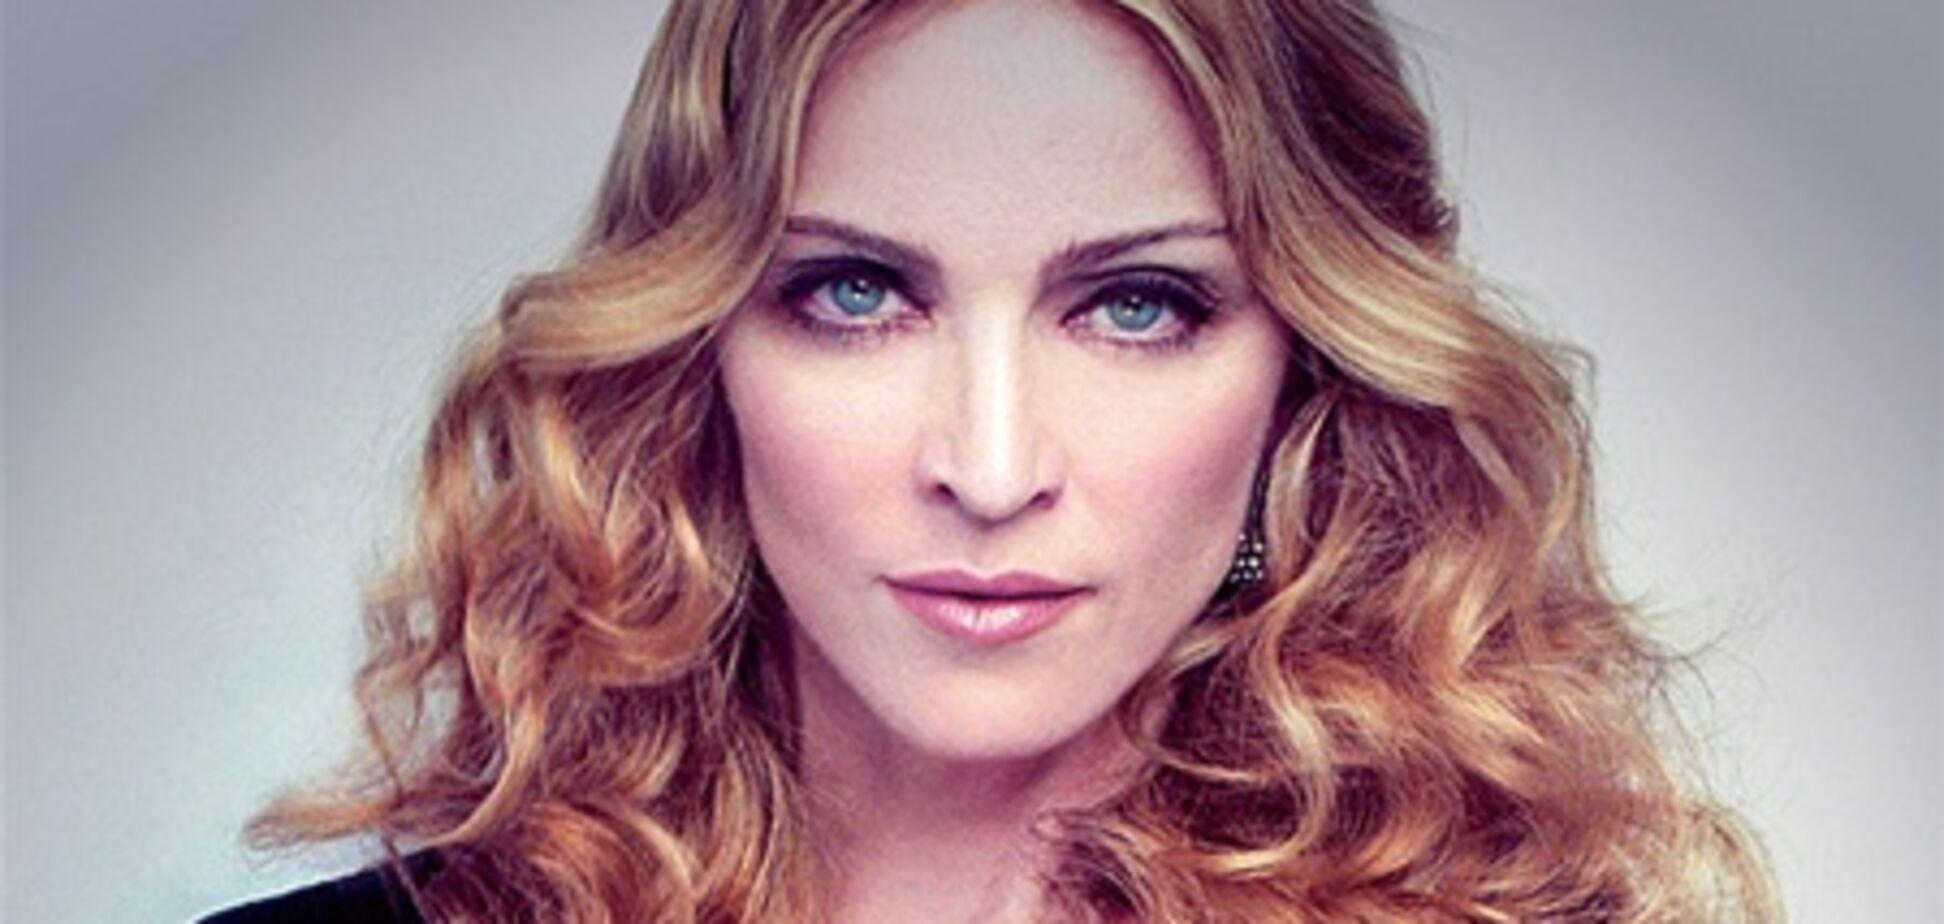 Мадонна отказала в помощи бездомному брату